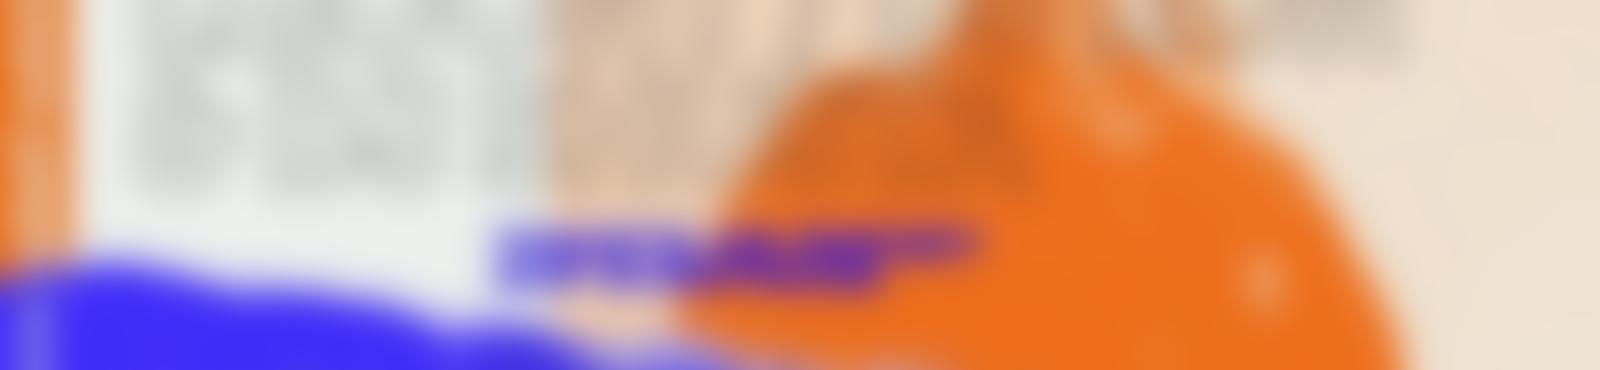 Blurred bc4bcaa0 09cc 4909 91d5 c60af6329f80